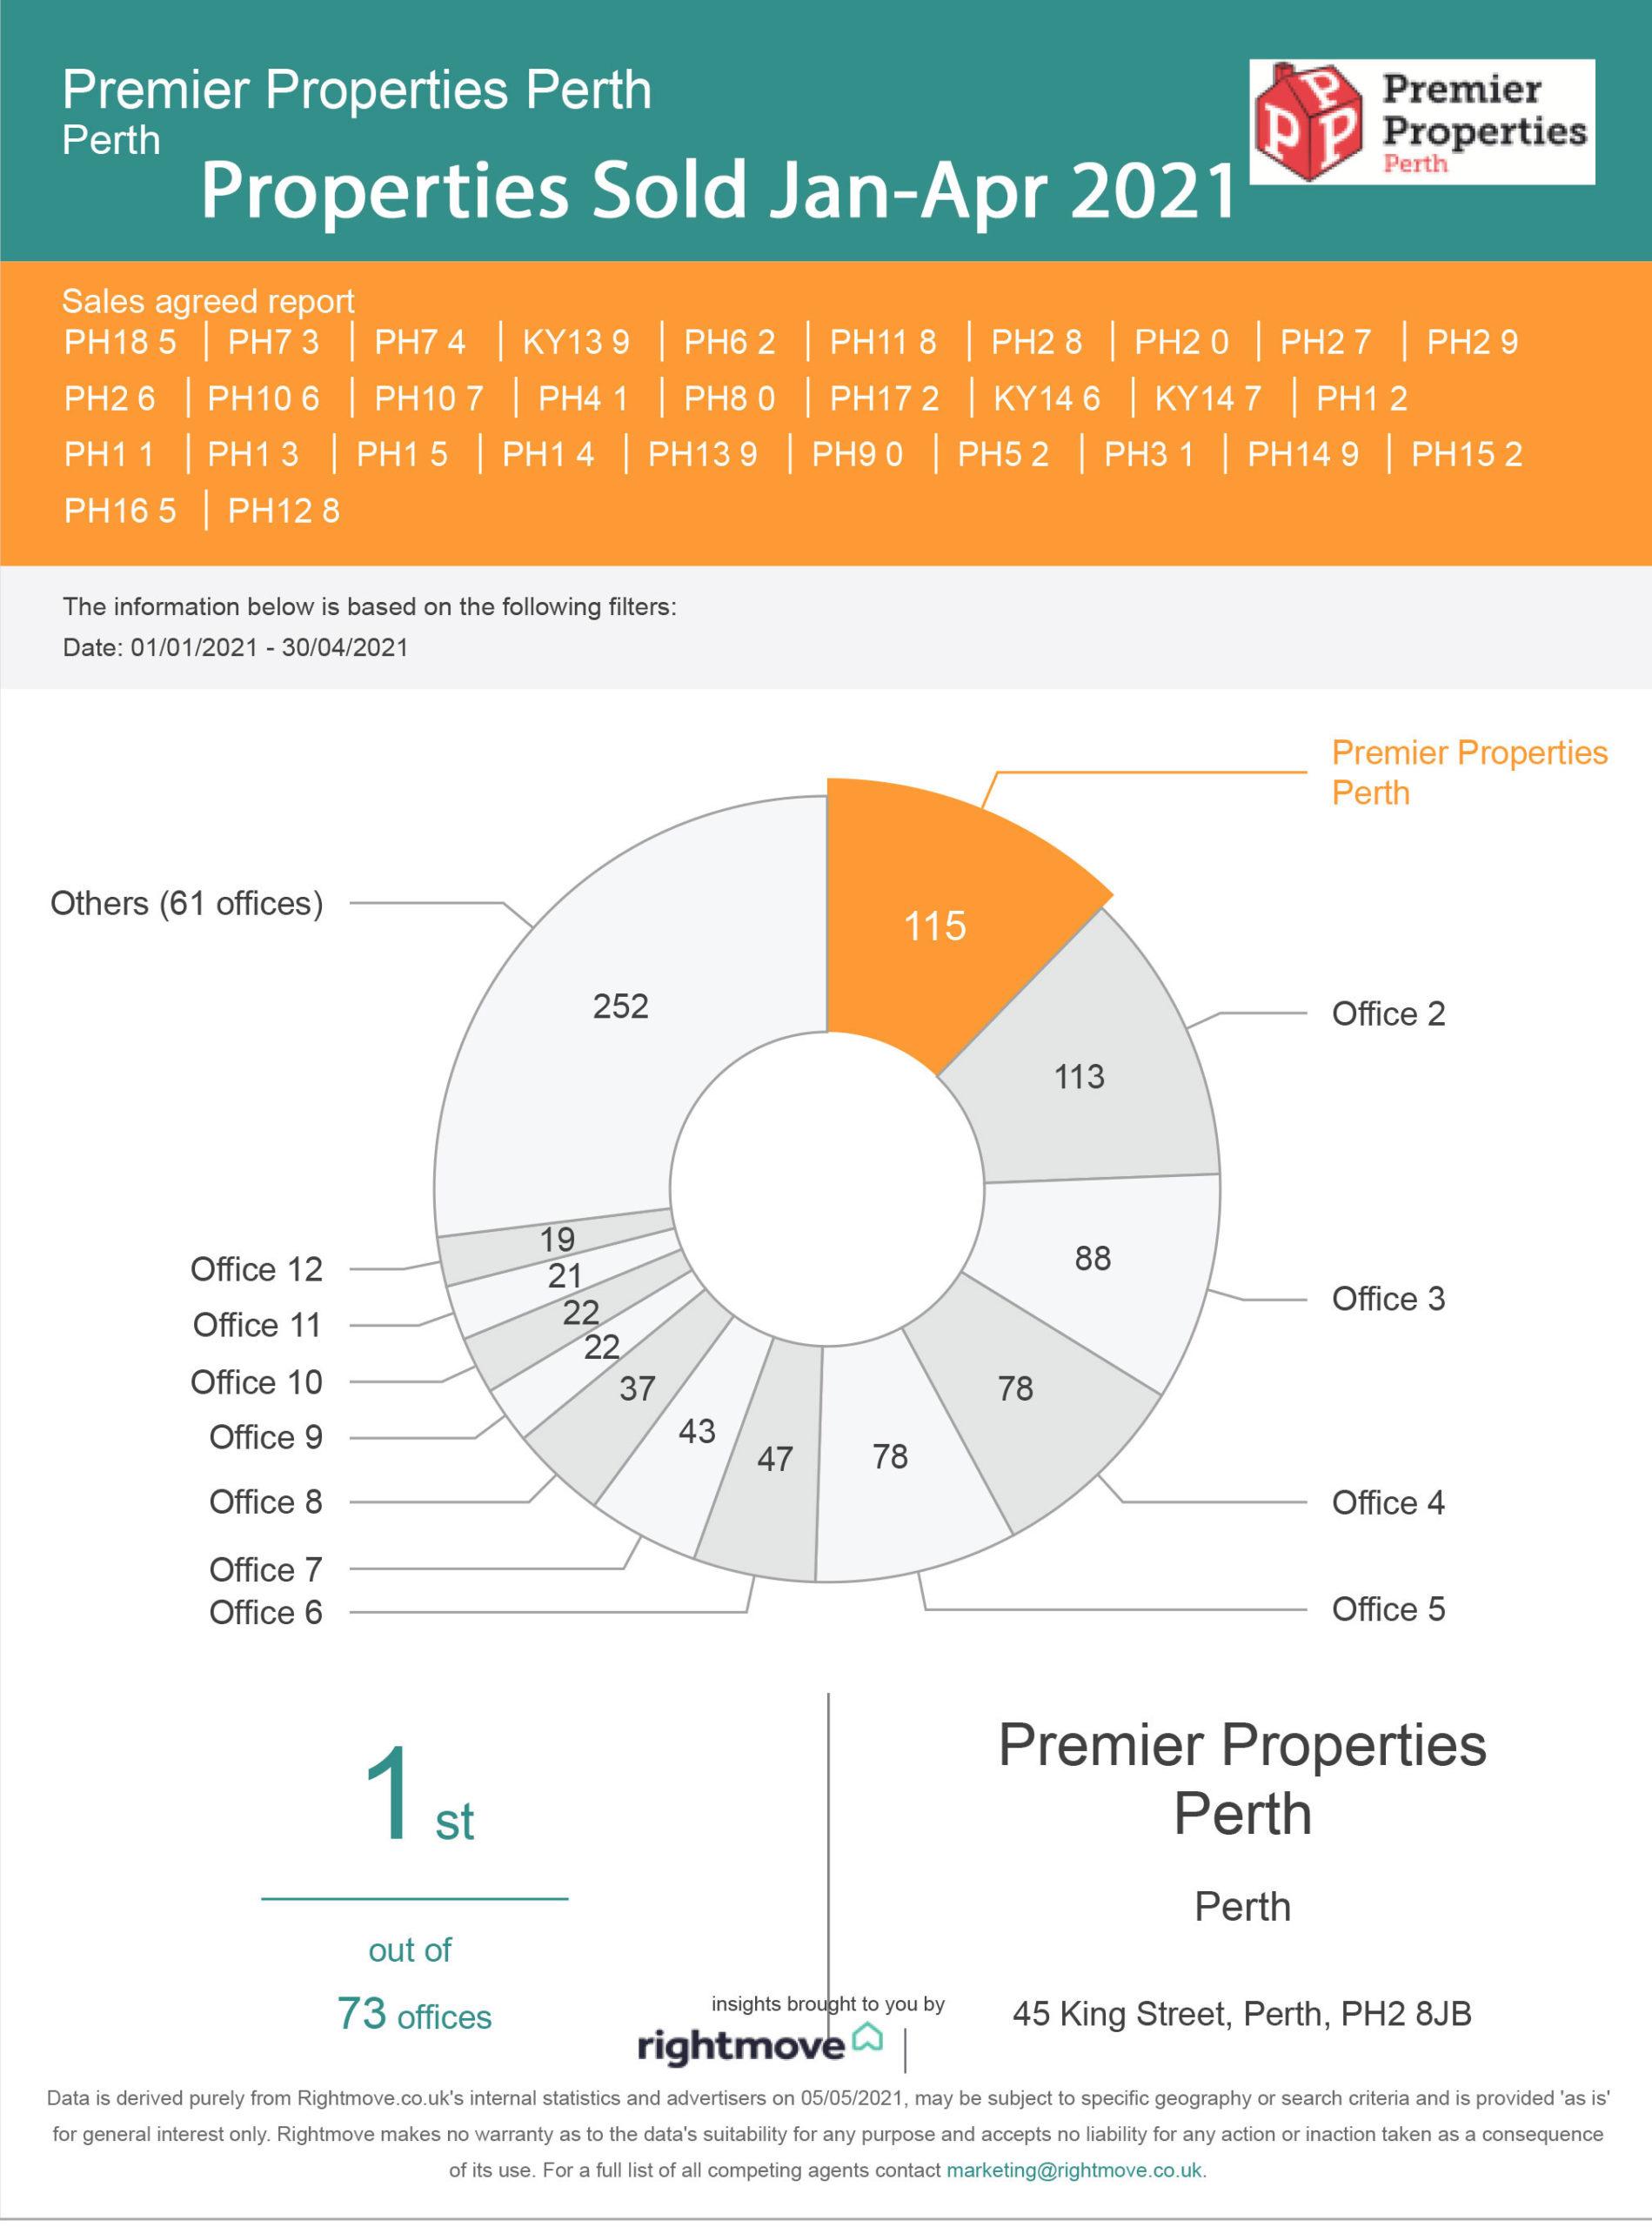 Properties Sold in Perthshire Jan-Apr 2021